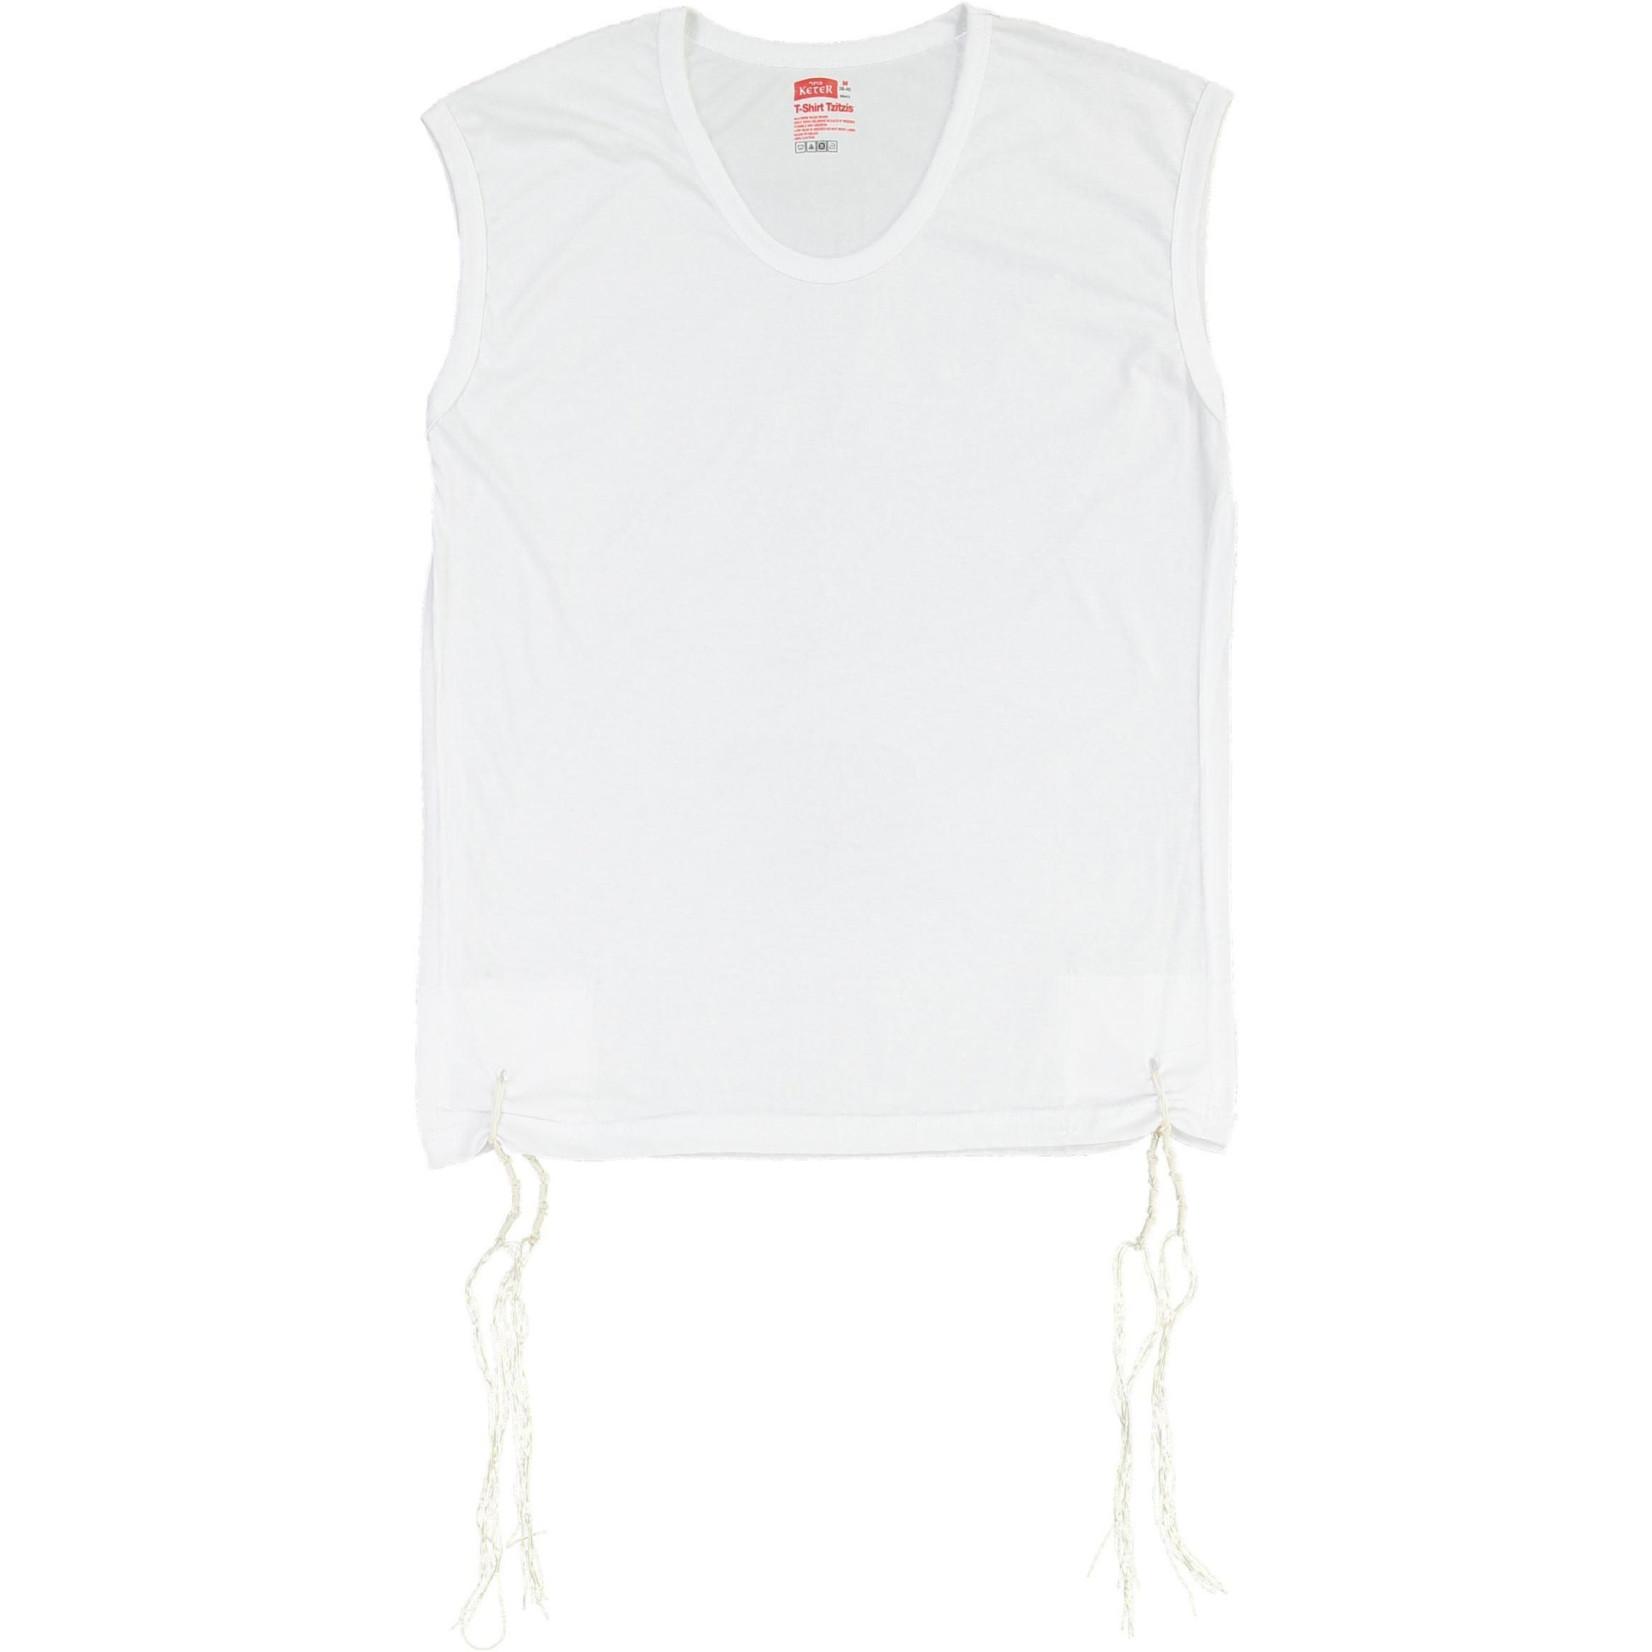 Undershirt-Style Arbah Kanfot, 100% Cotton, Round Neck, Size 3